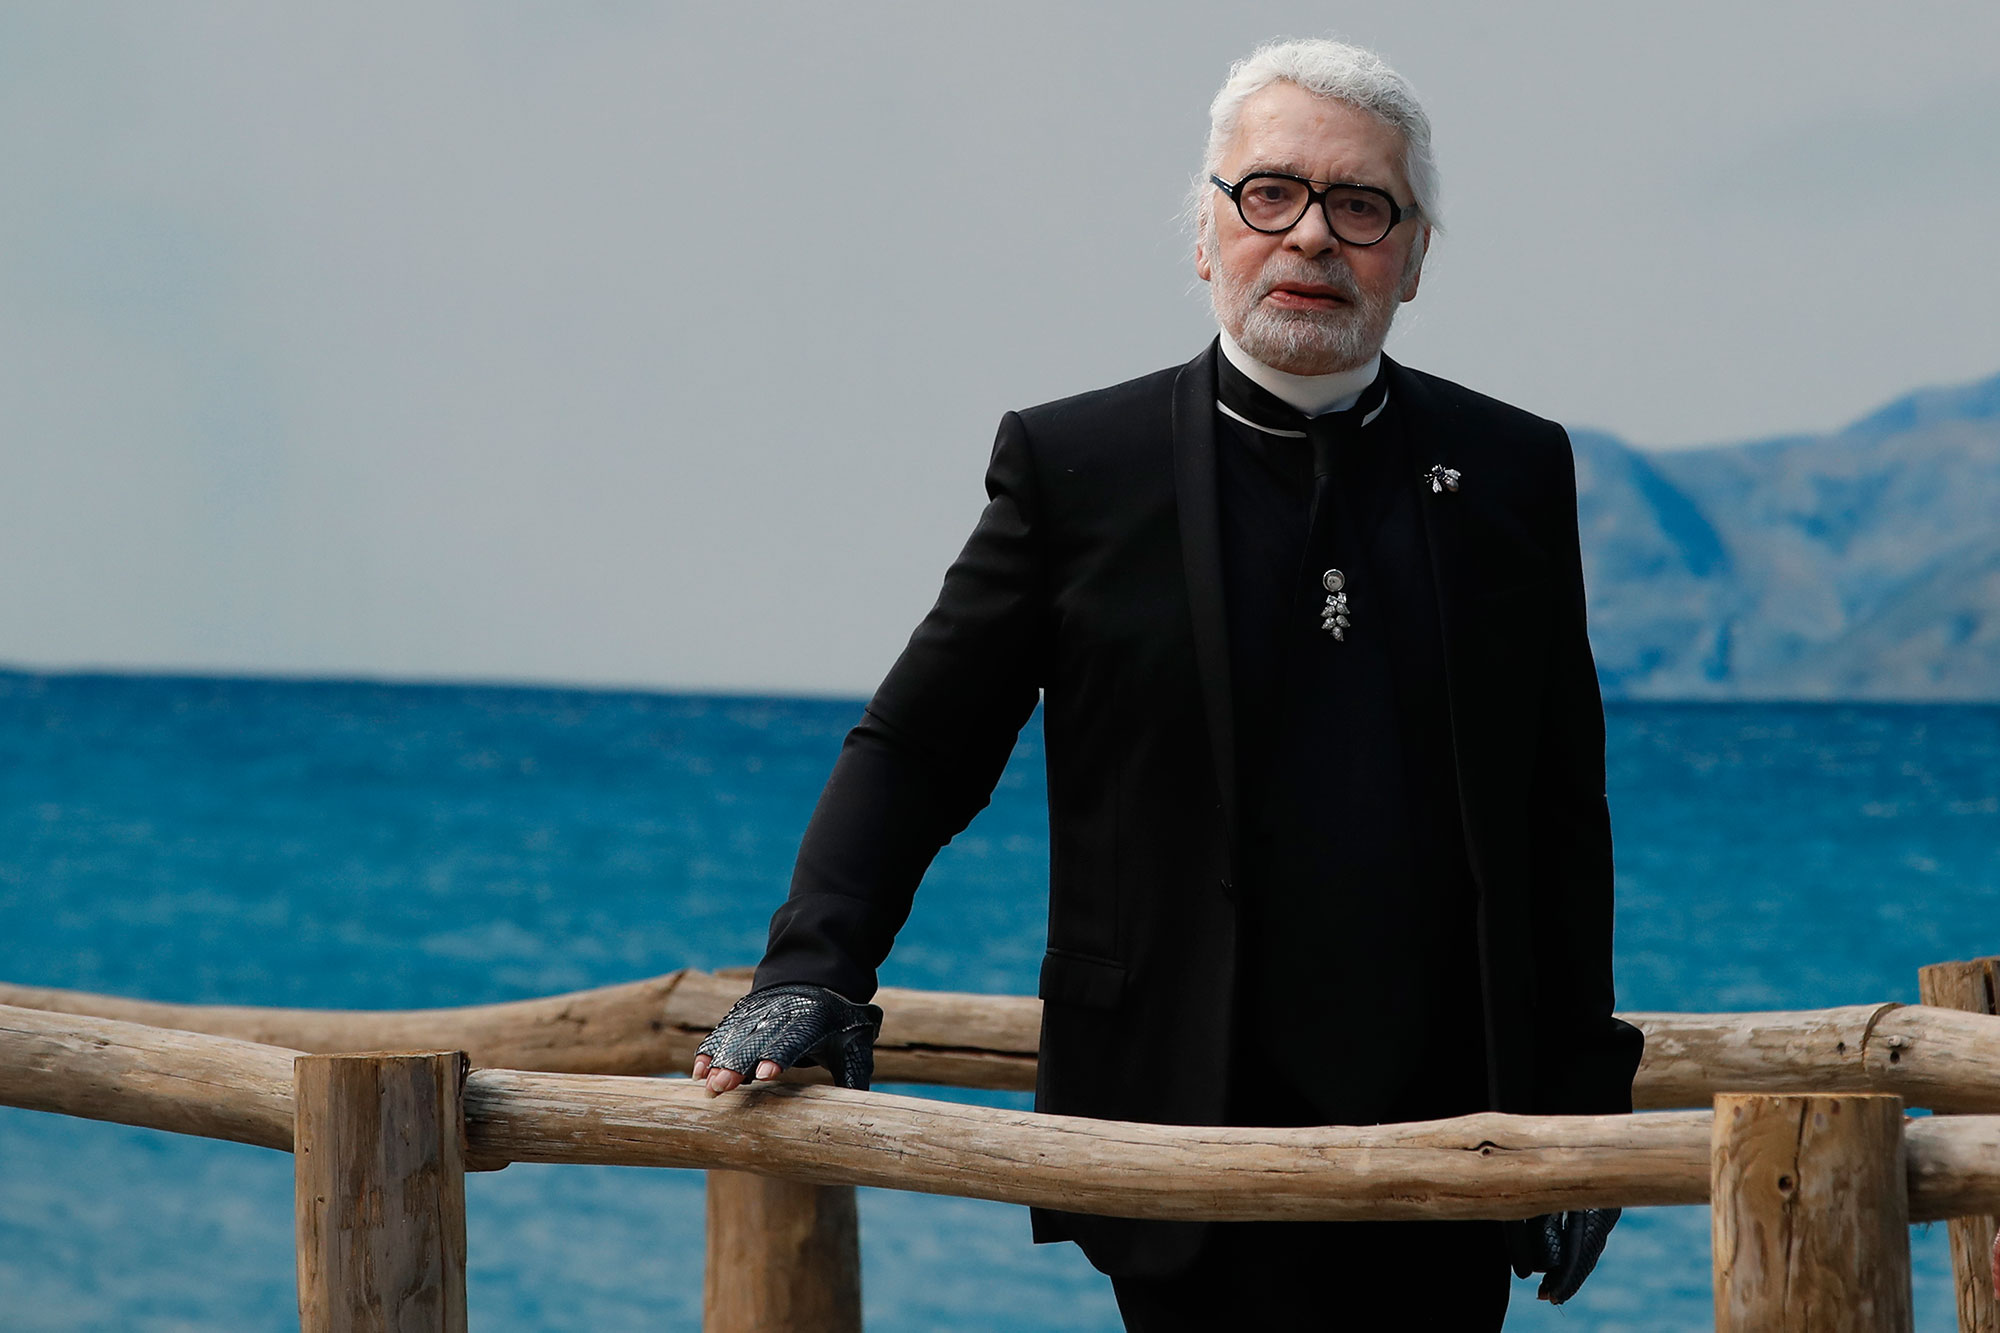 <div class='meta'><div class='origin-logo' data-origin='none'></div><span class='caption-text' data-credit='Christophe Ena/AP Photo'>Karl Lagerfeld, a Chanel fashion icon, has died.</span></div>